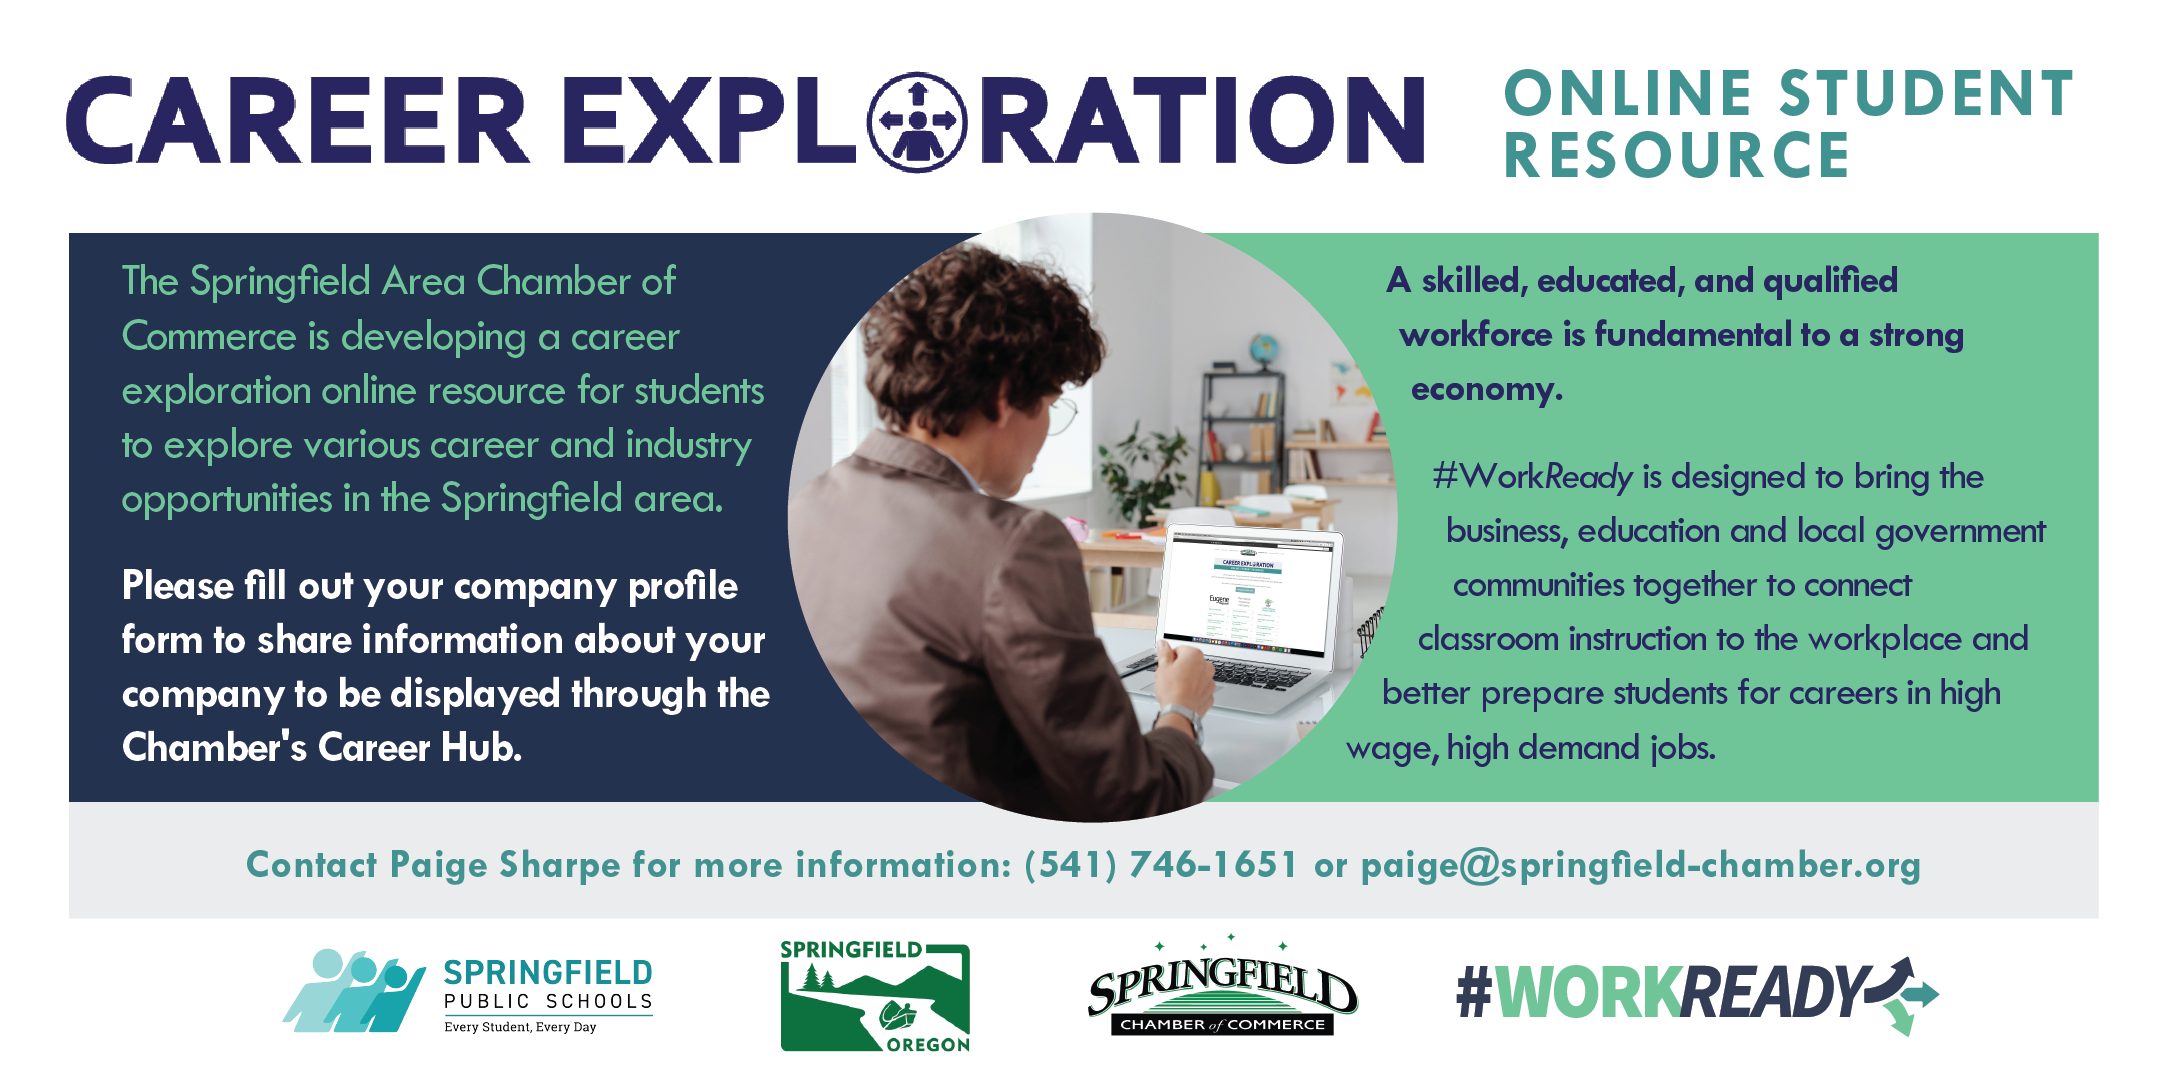 Career Exploration Web Resource